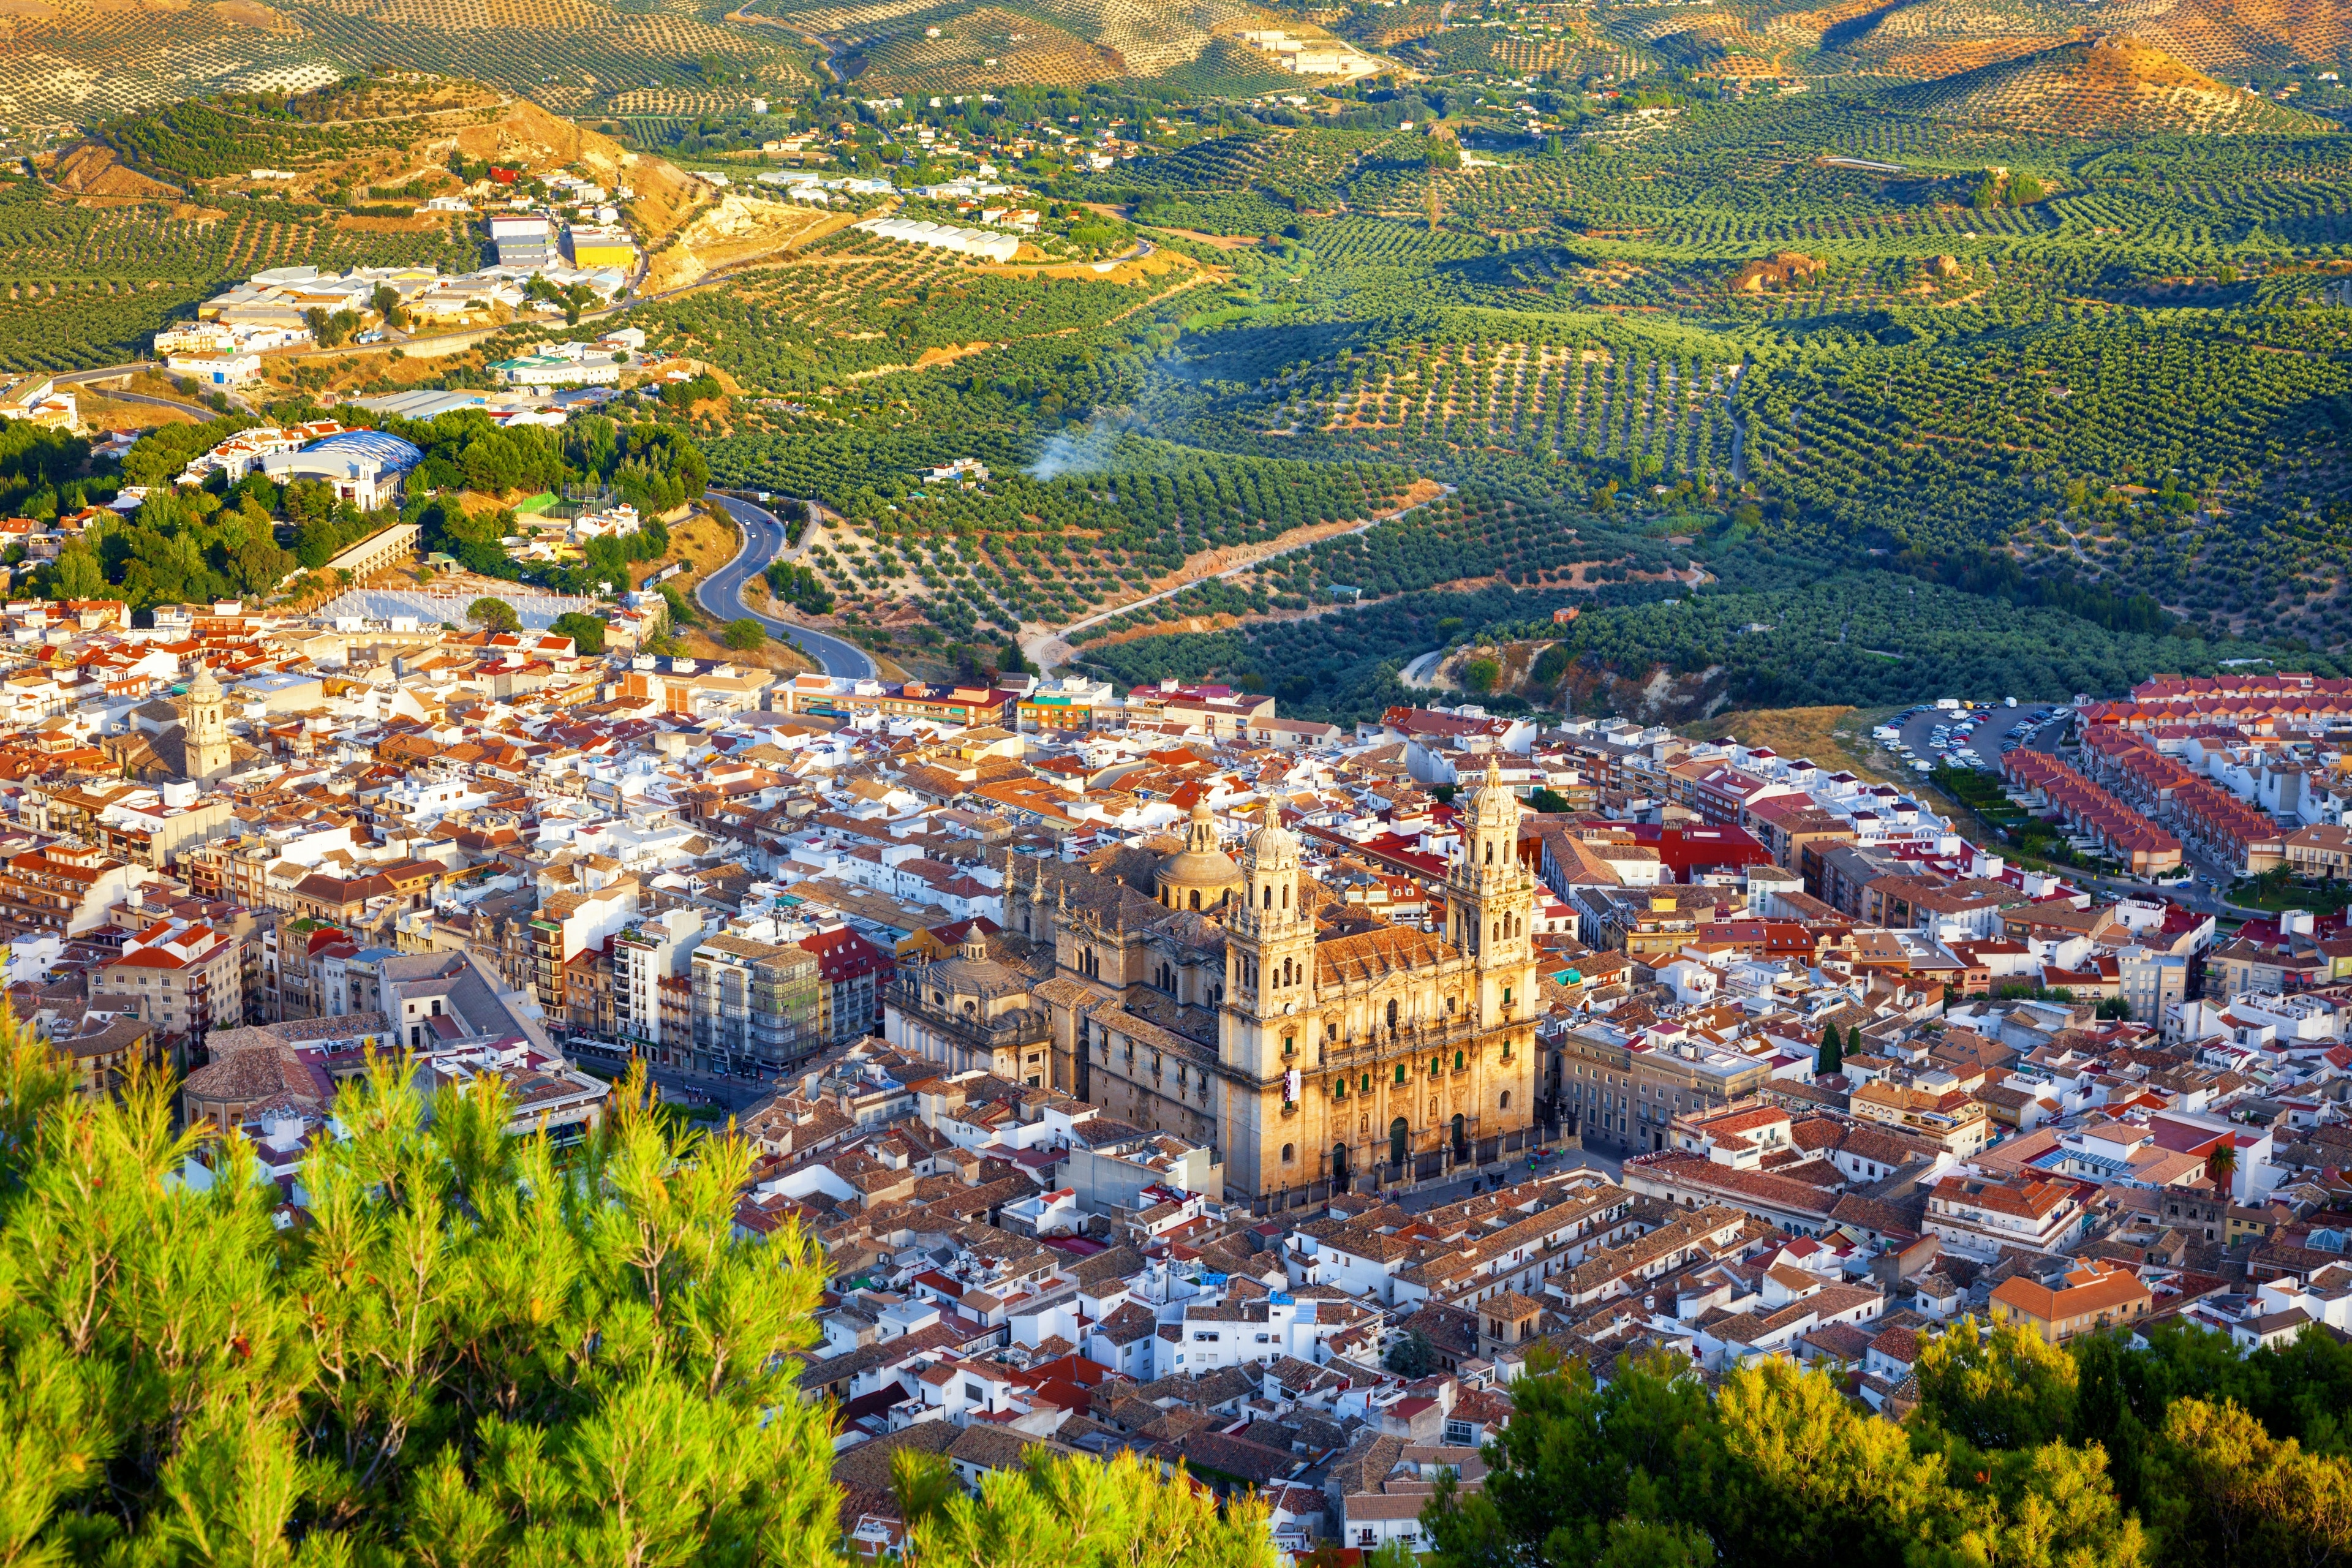 Jaen, Andalusia, Spain